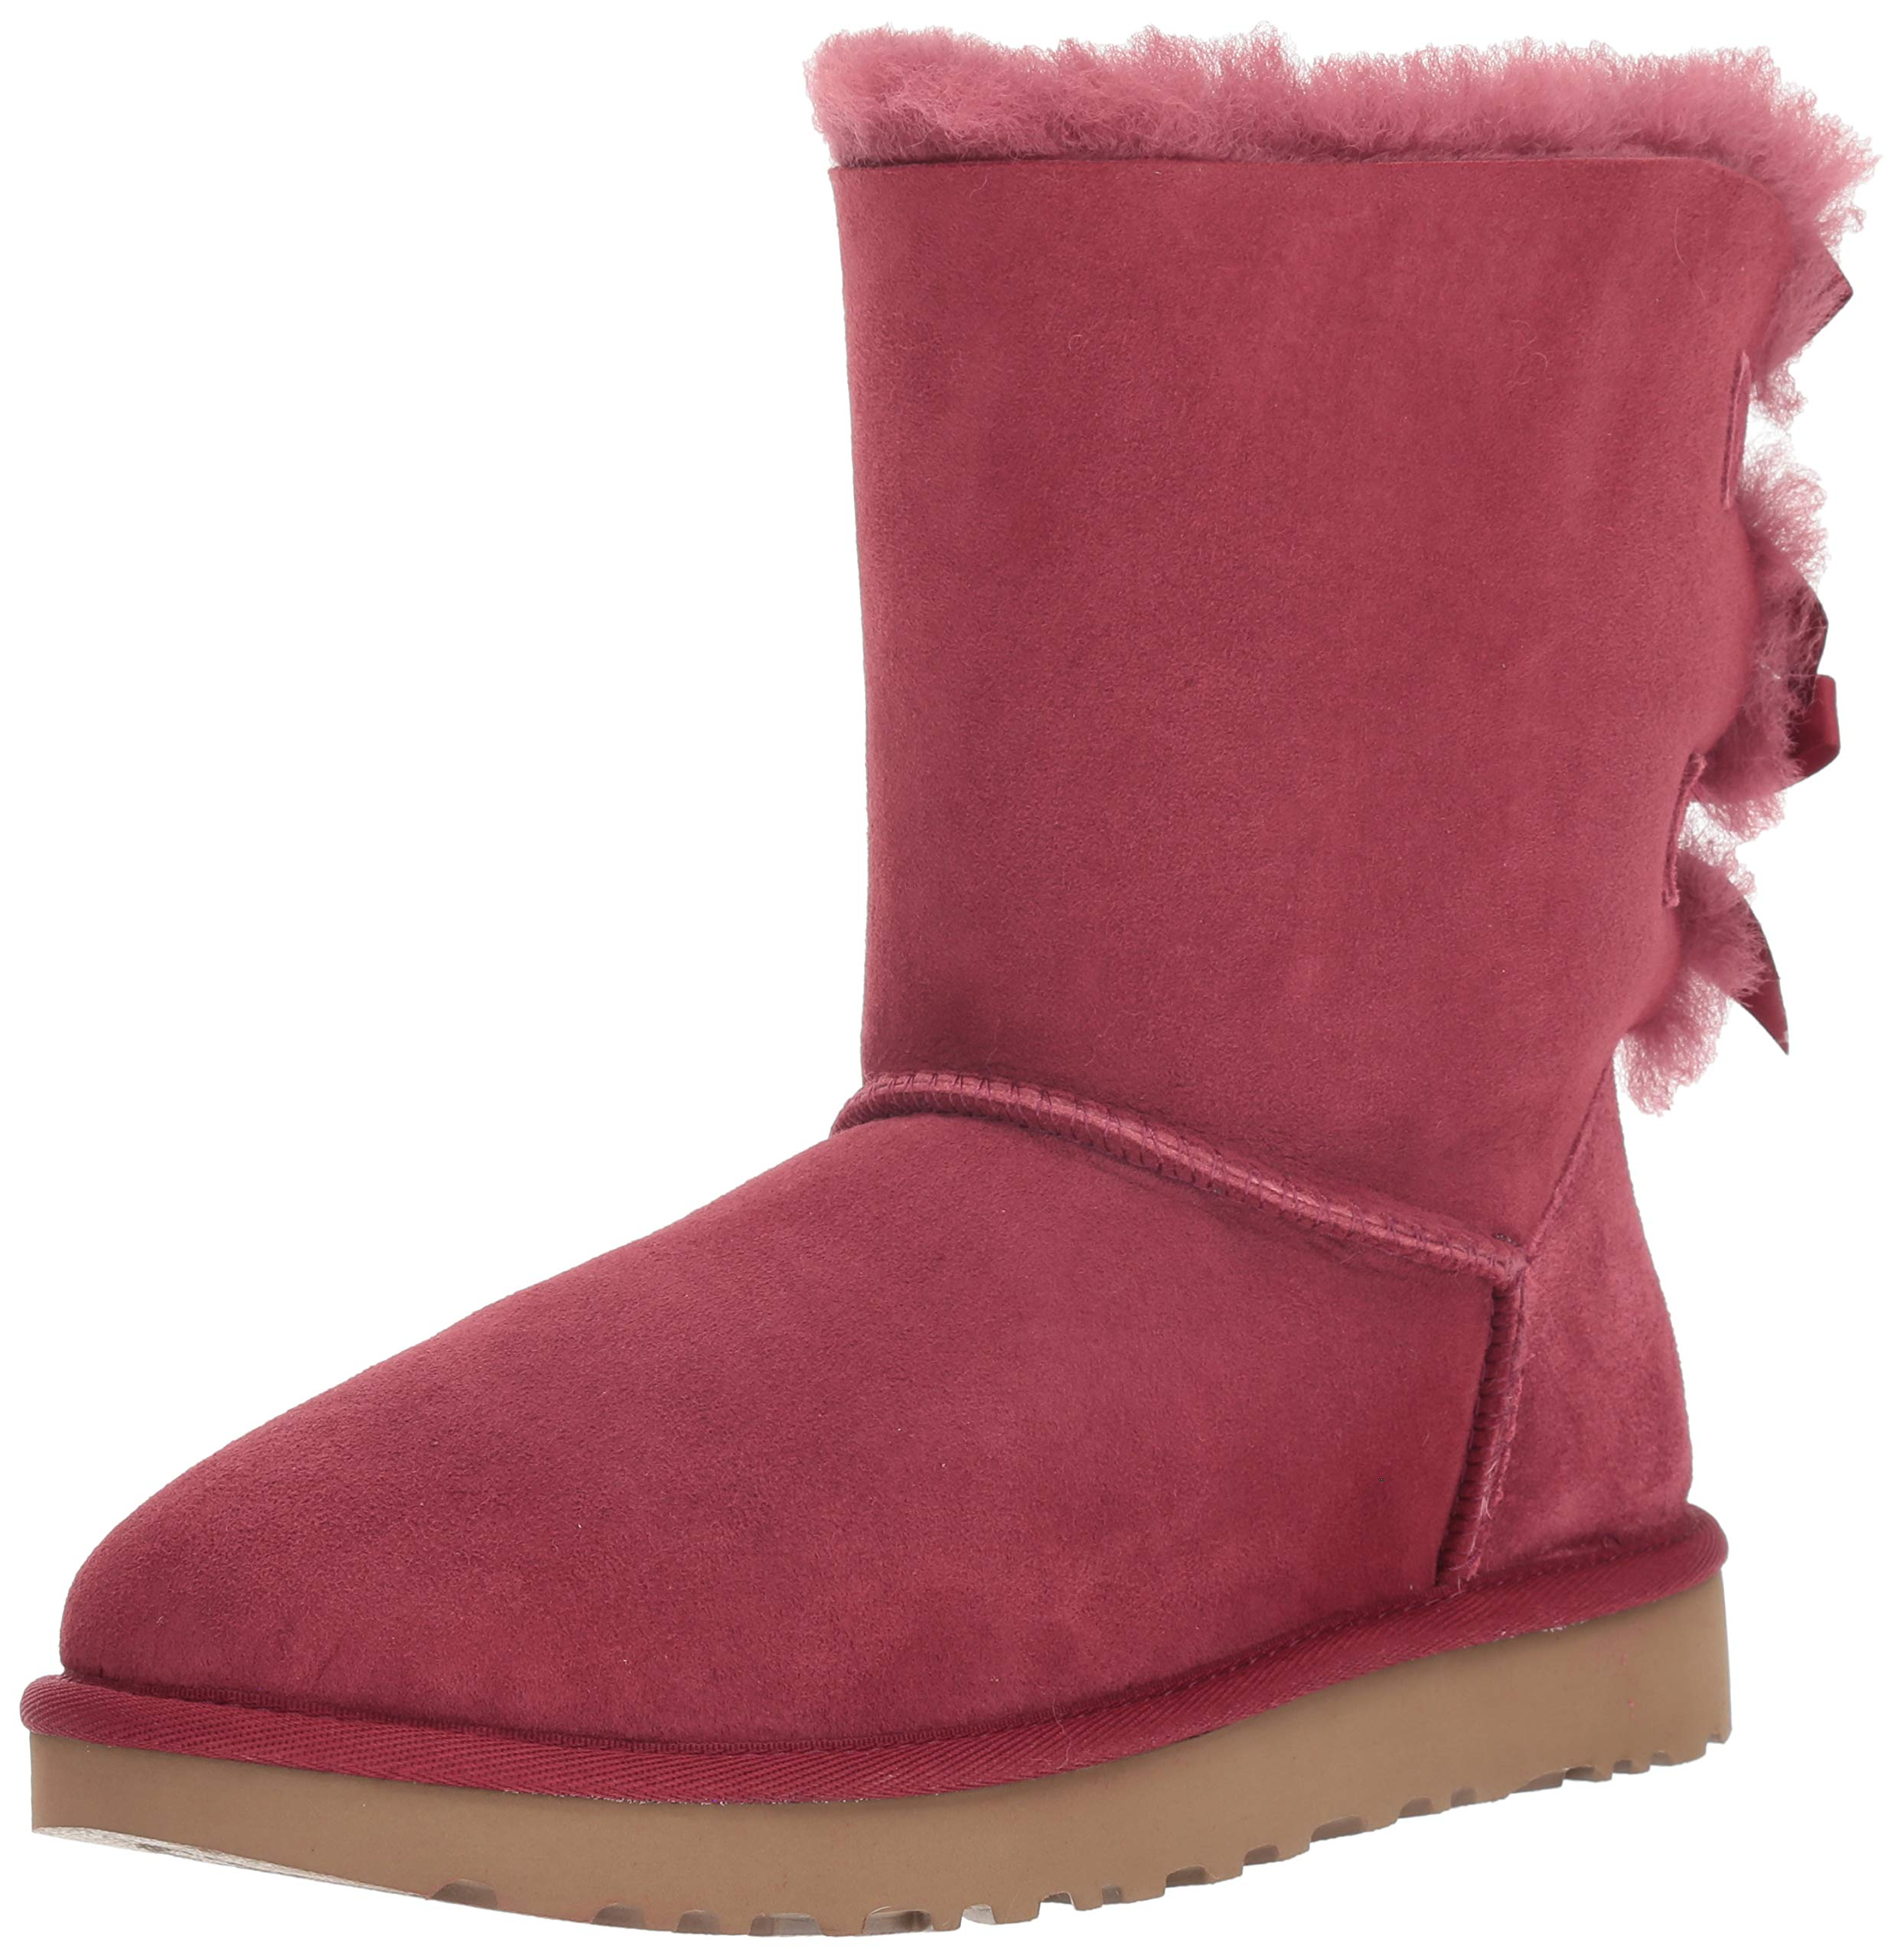 UGG Women's W Bailey Bow II Fashion Boot Garnet 12 M US